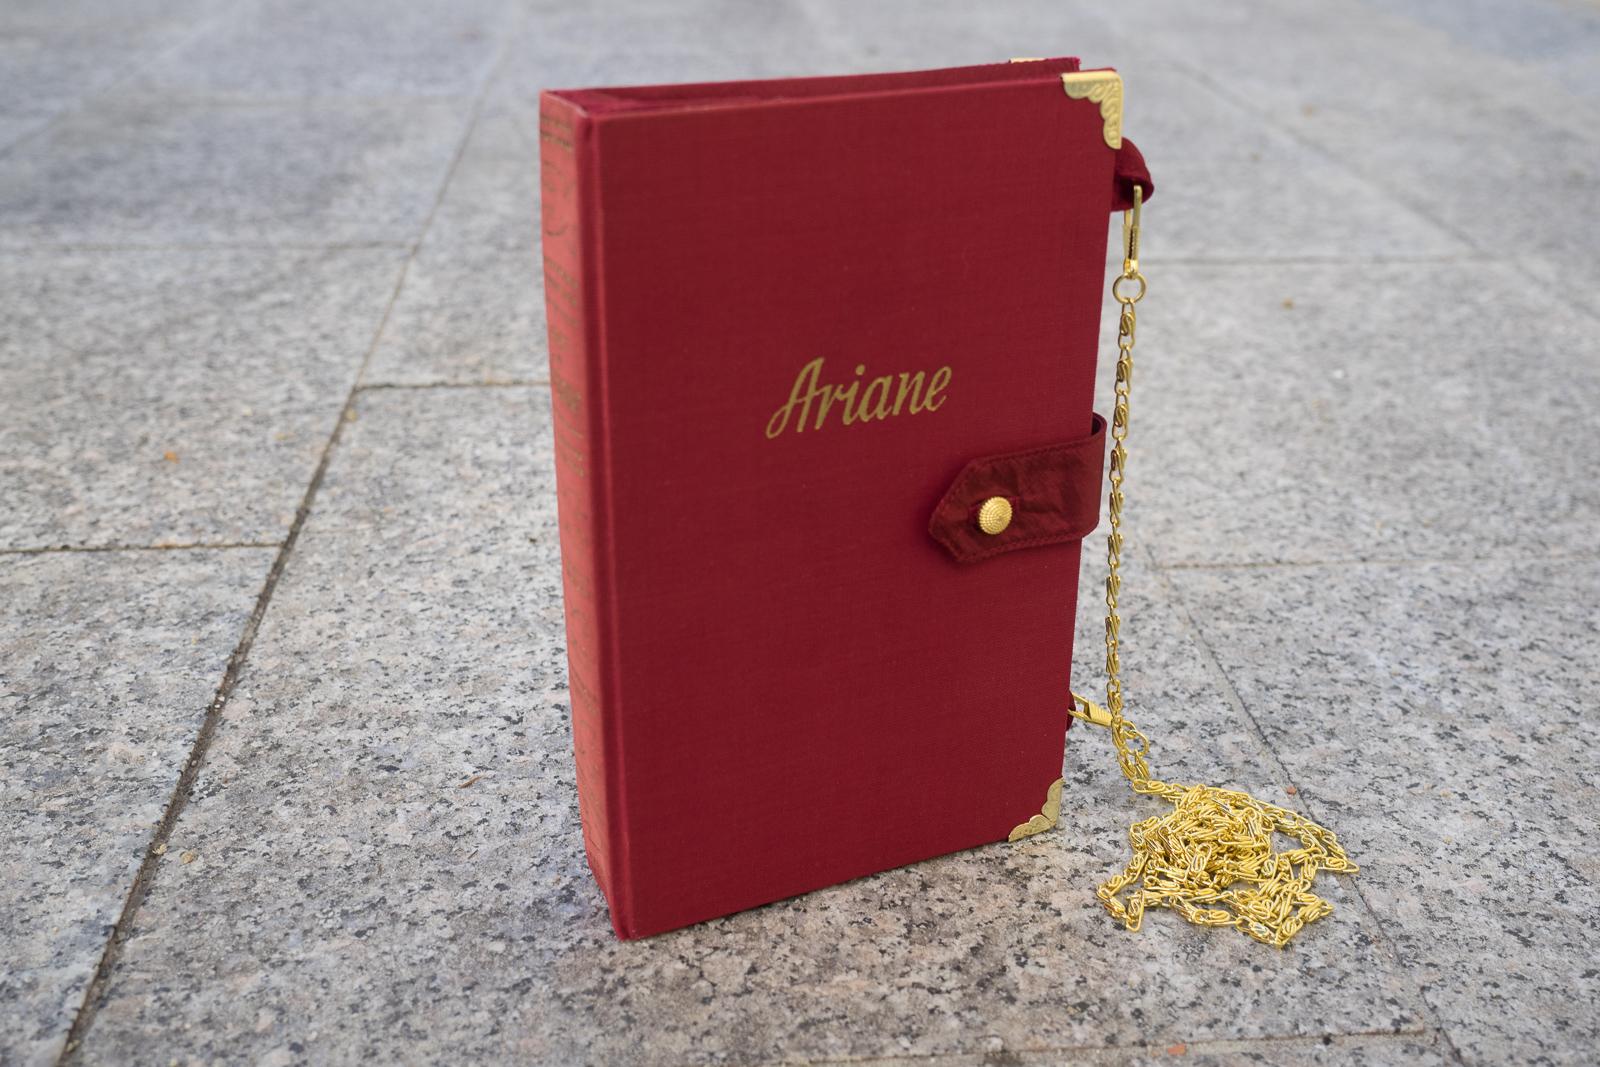 Ariane Image